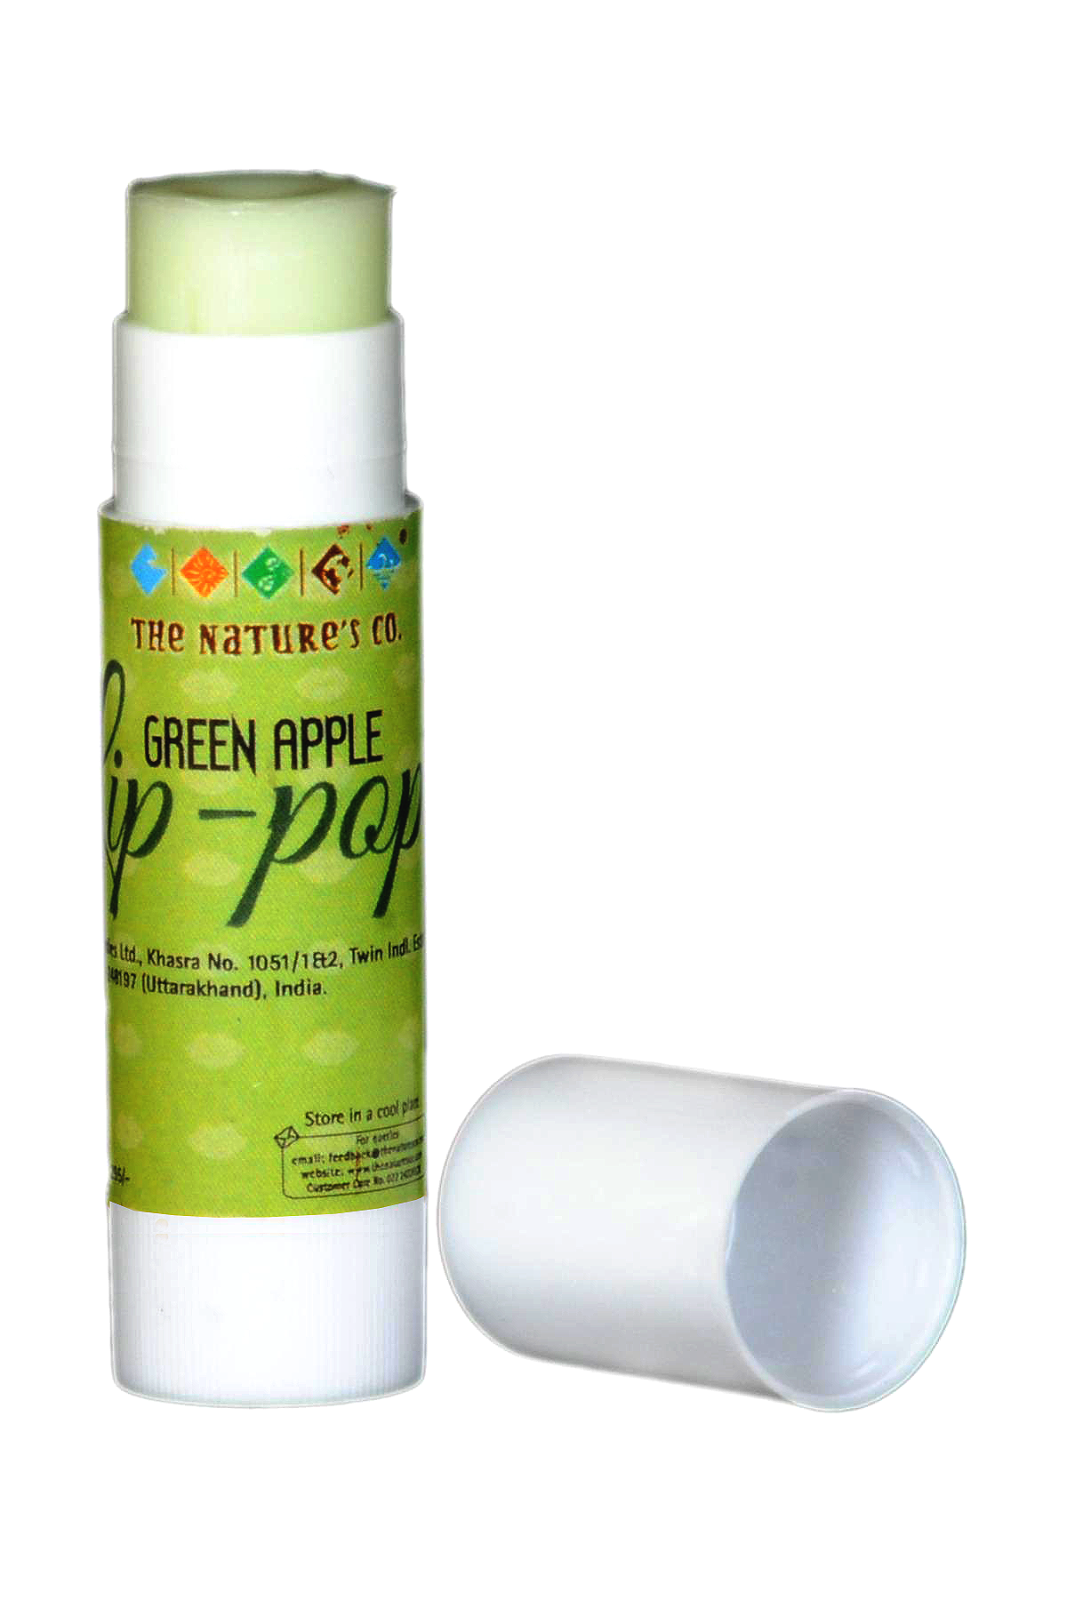 The Nature's Co.: Lip-Pops